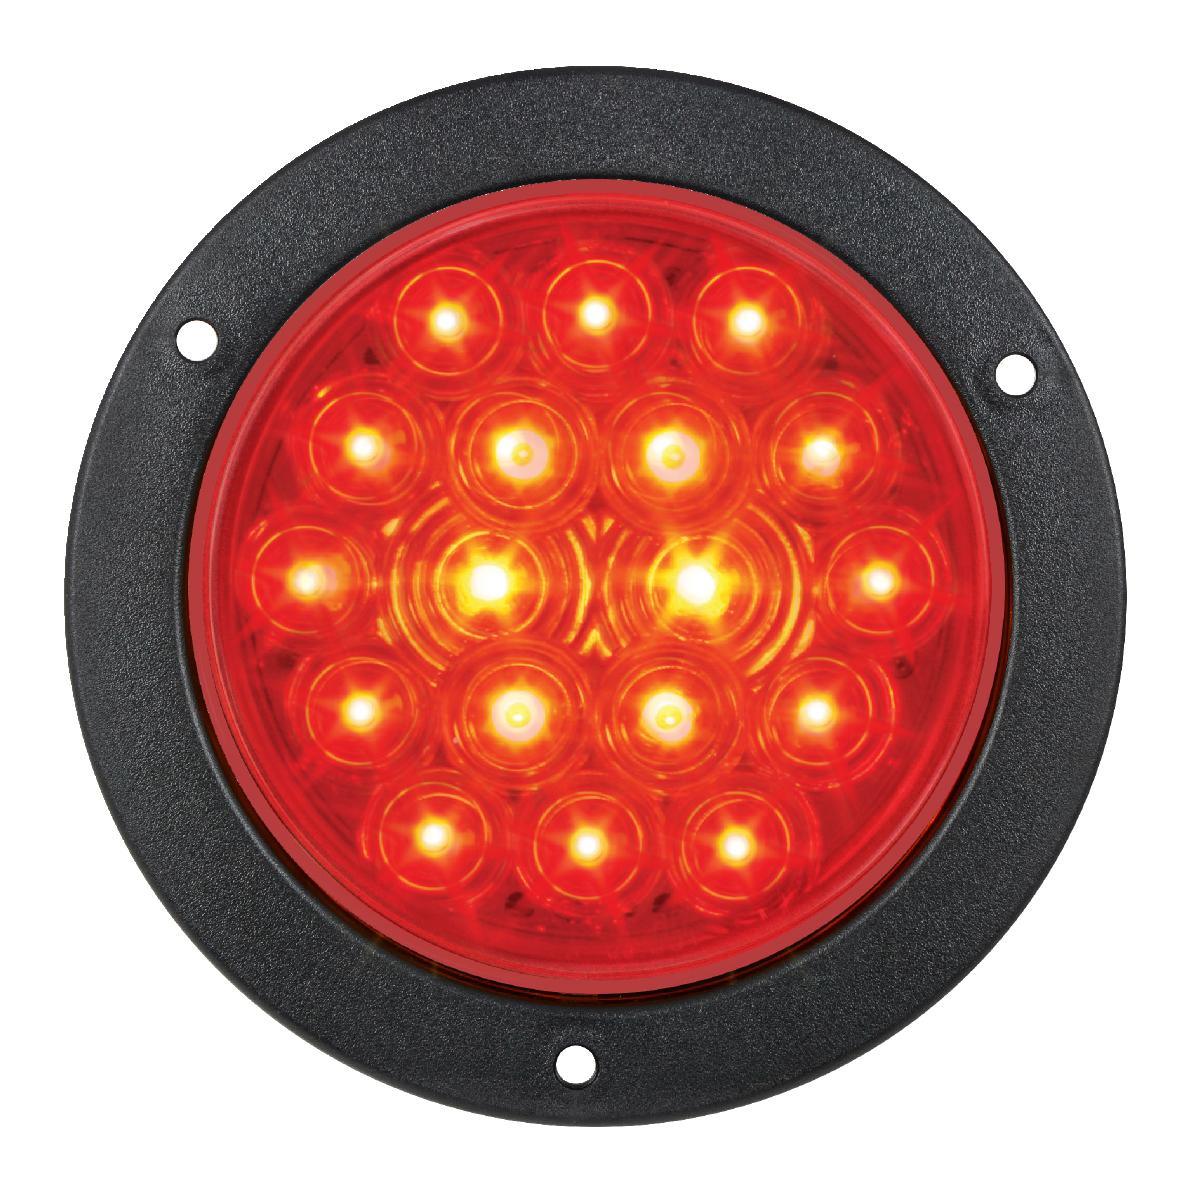 "75892 4"" Fleet LED Light with Black Flange Mount in 3 Wires"